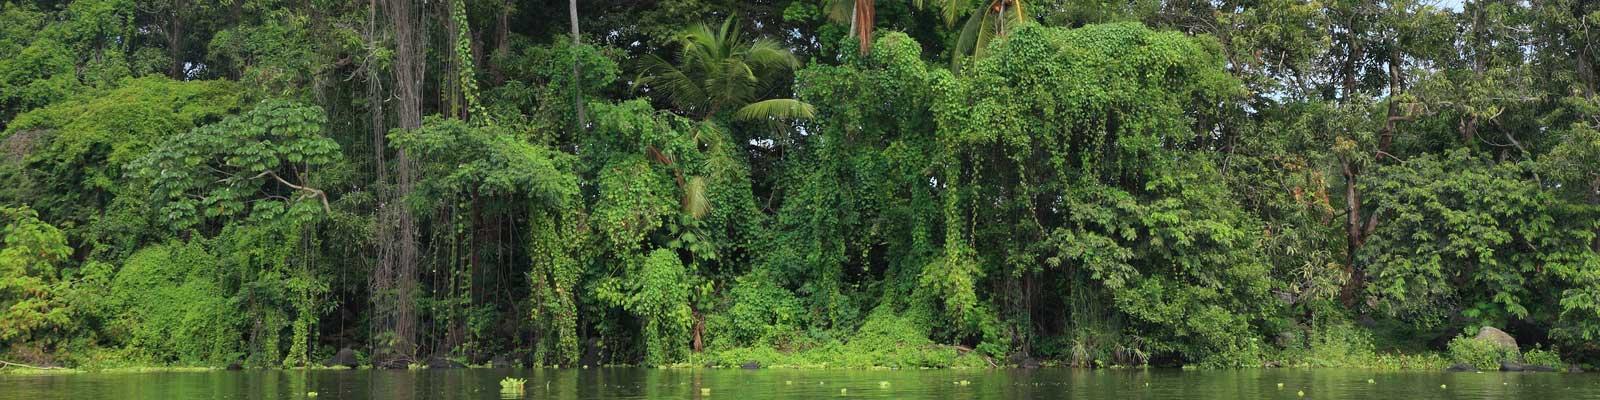 Nicaragua Lagos Florestas casas, apartamentos, vilas, duplex, andares.